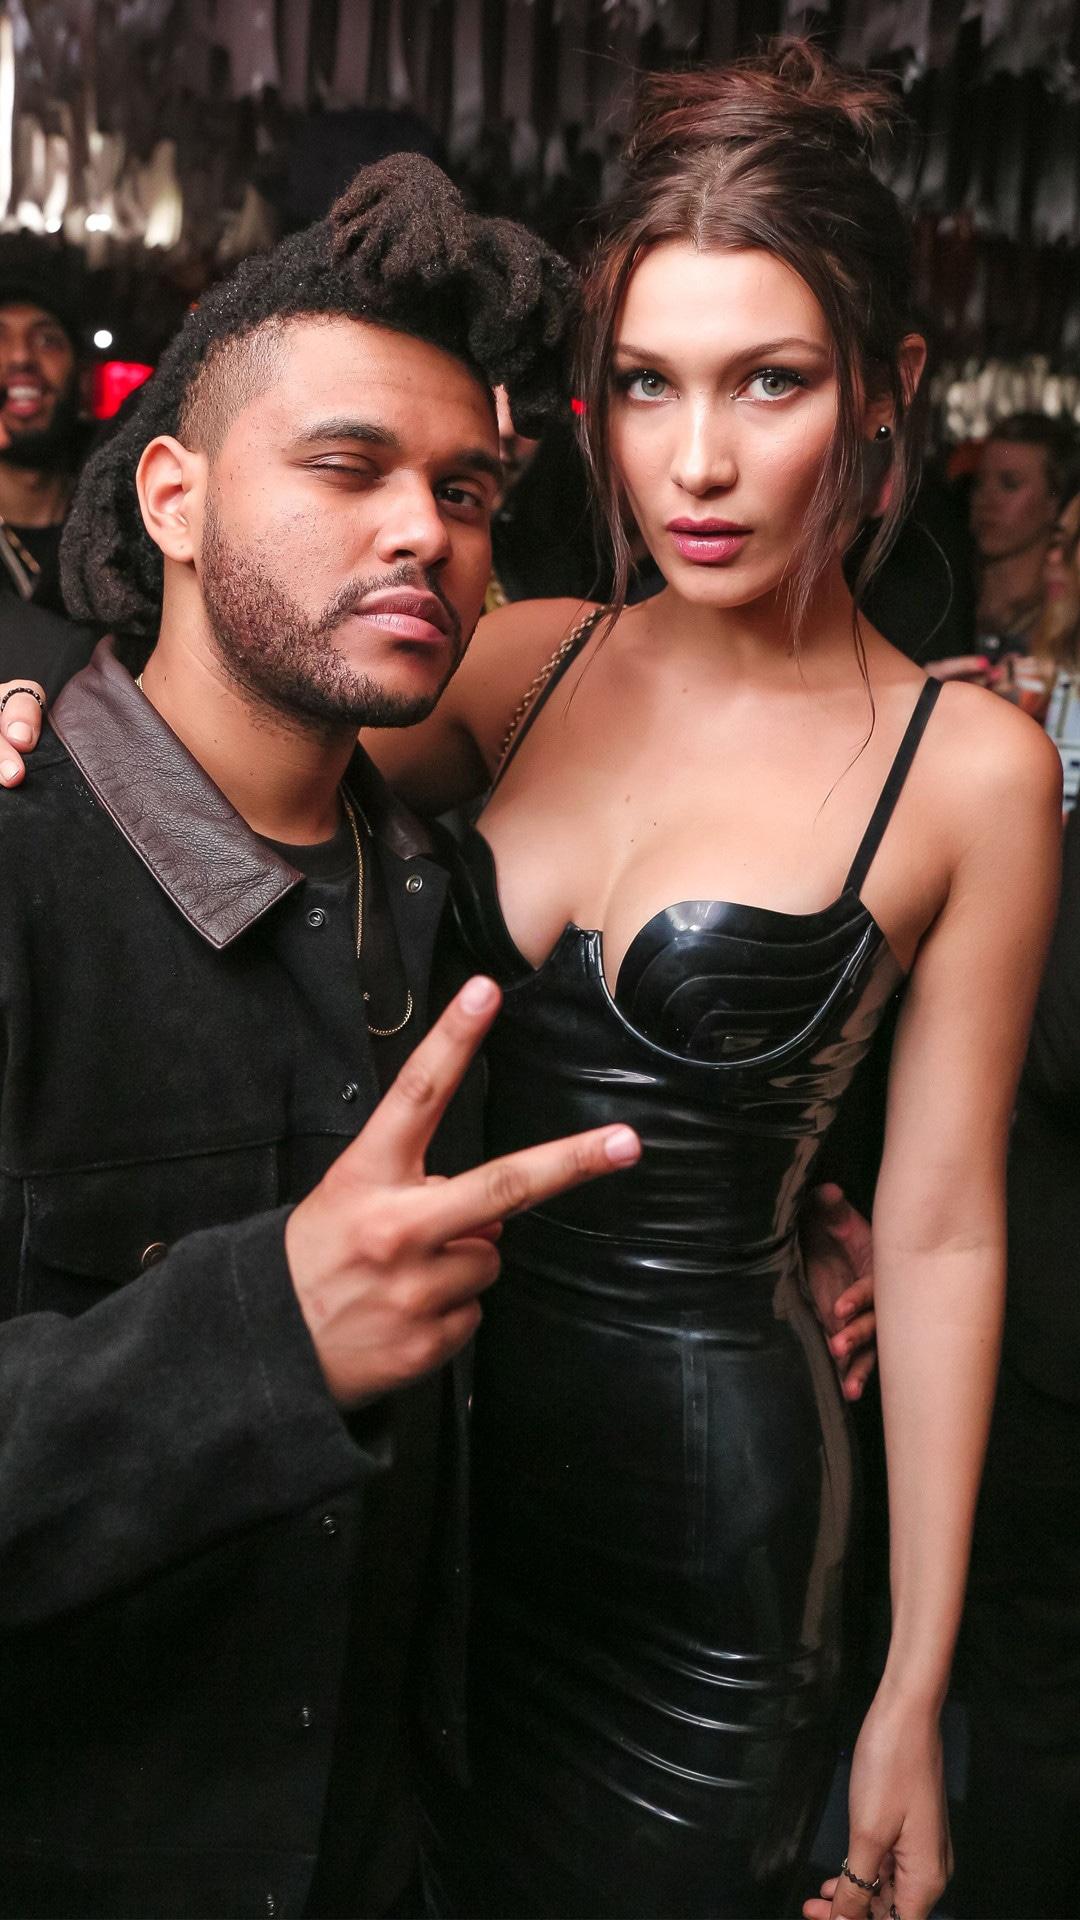 The Weeknd, Bella Hadid, MET Gala 2016, Inside Party Pics, Exclusive